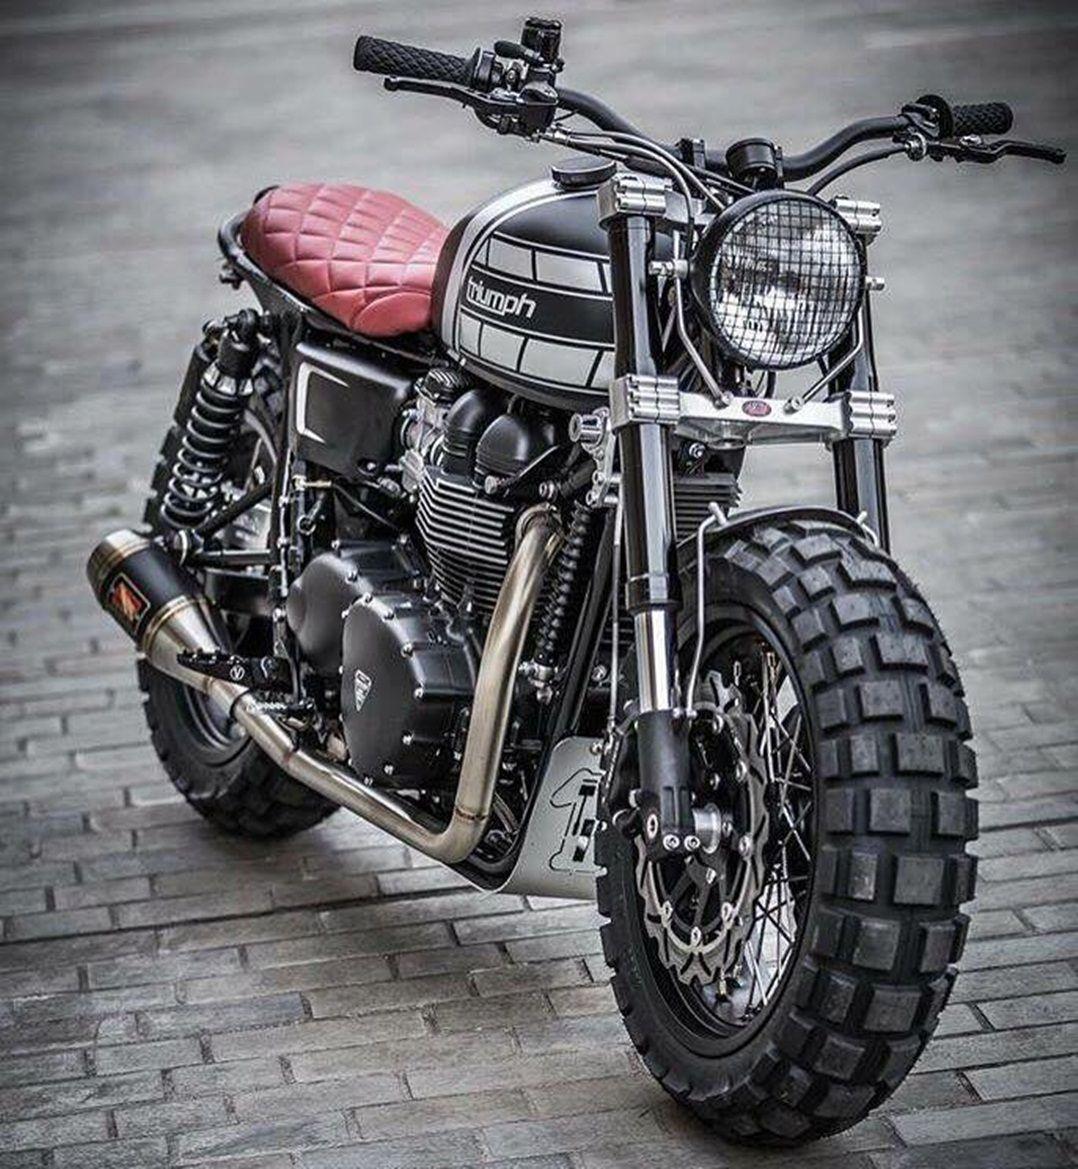 Yamaha Motorcycle Indianapolis